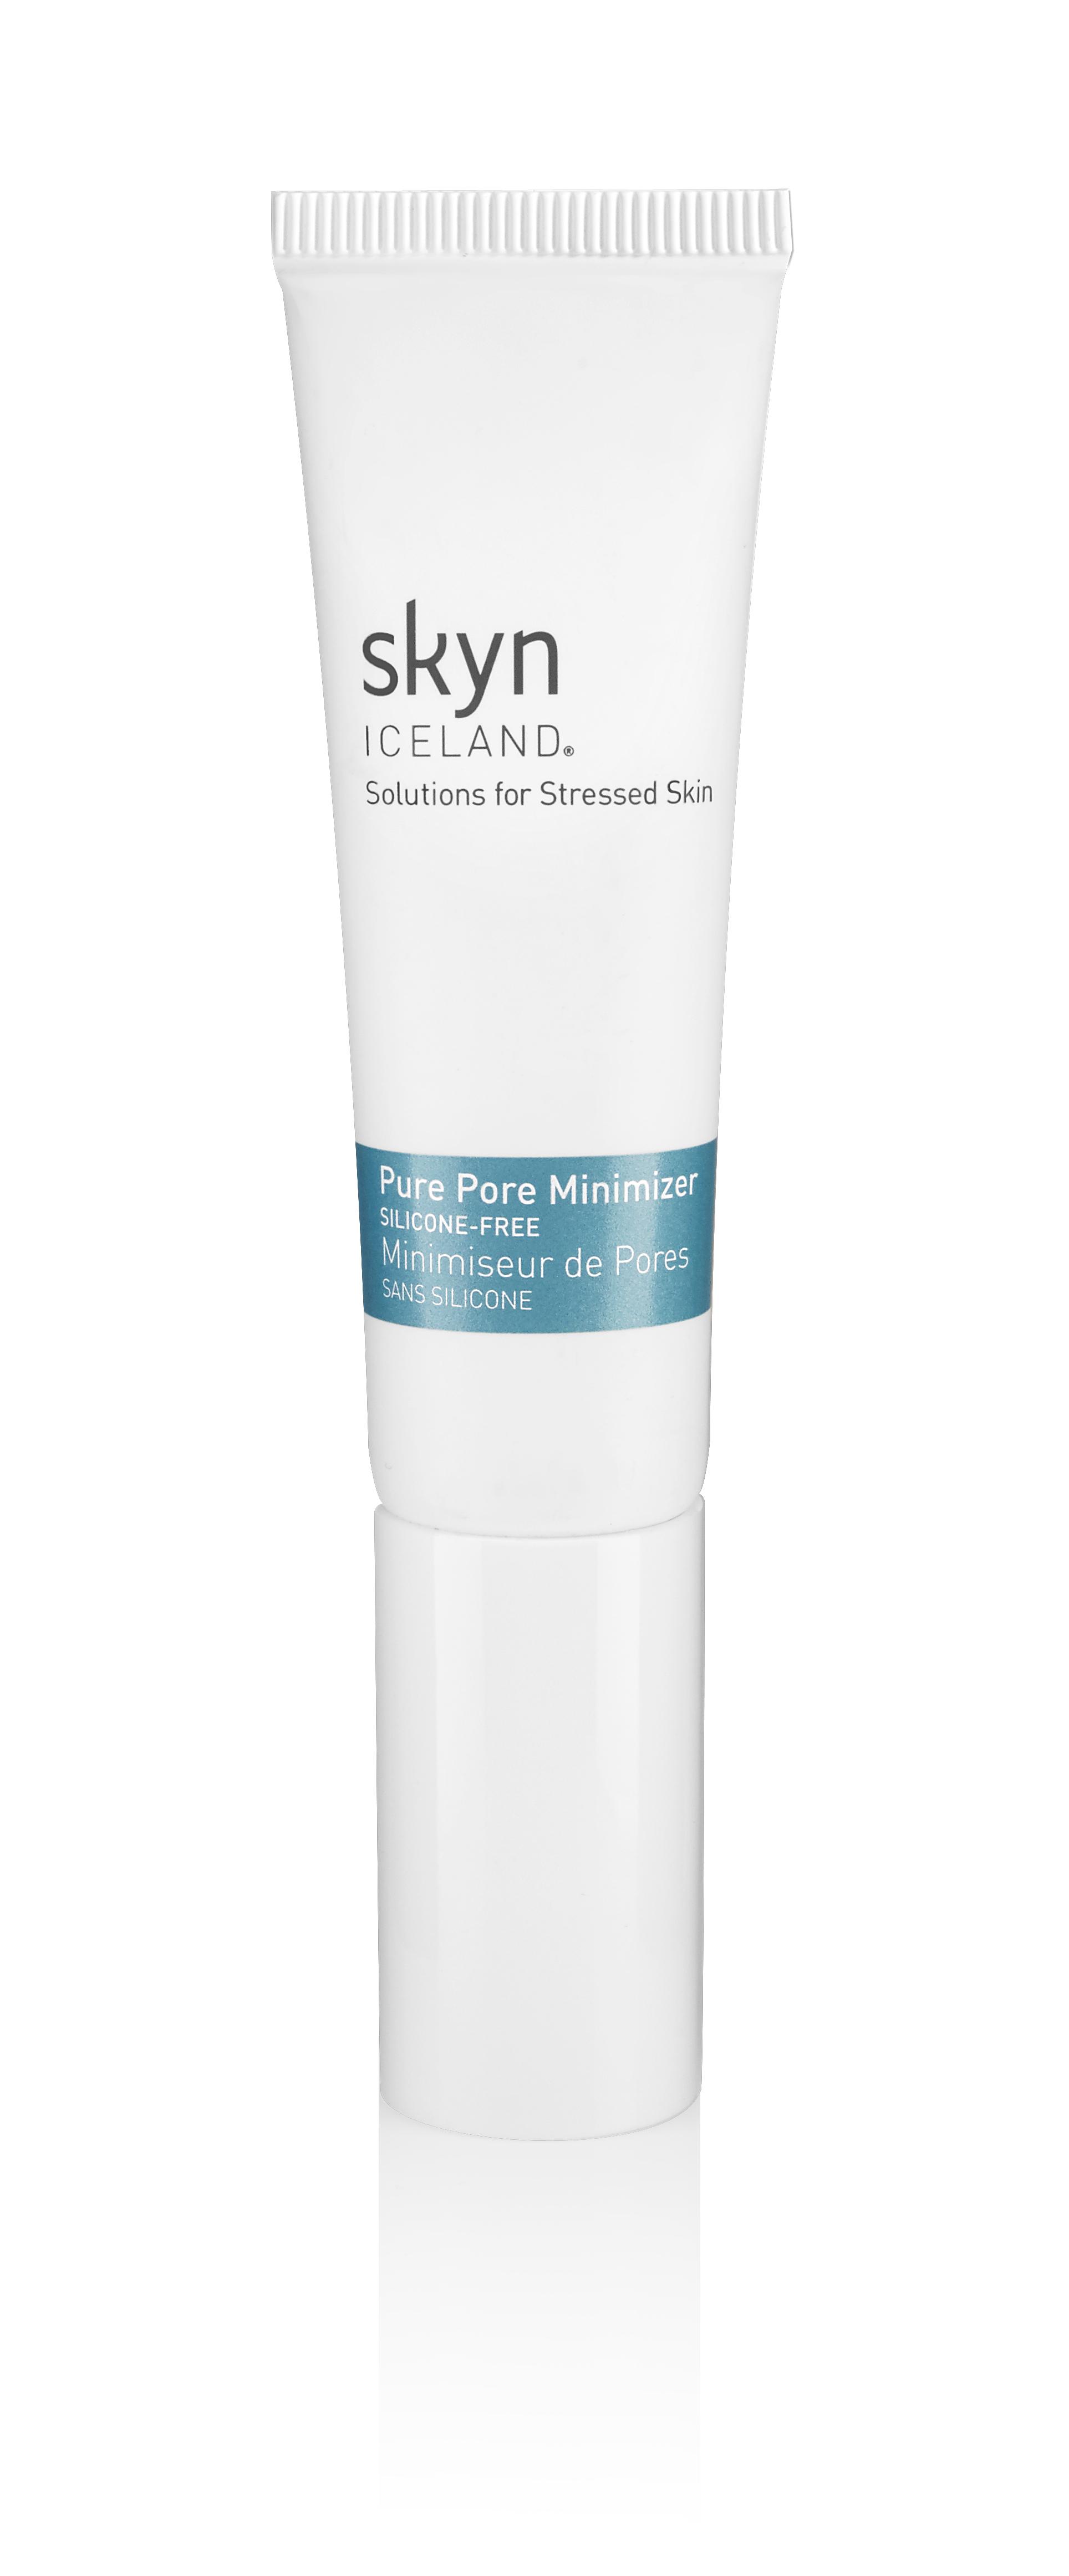 skyn ICELAND Pure Pore Minimizer